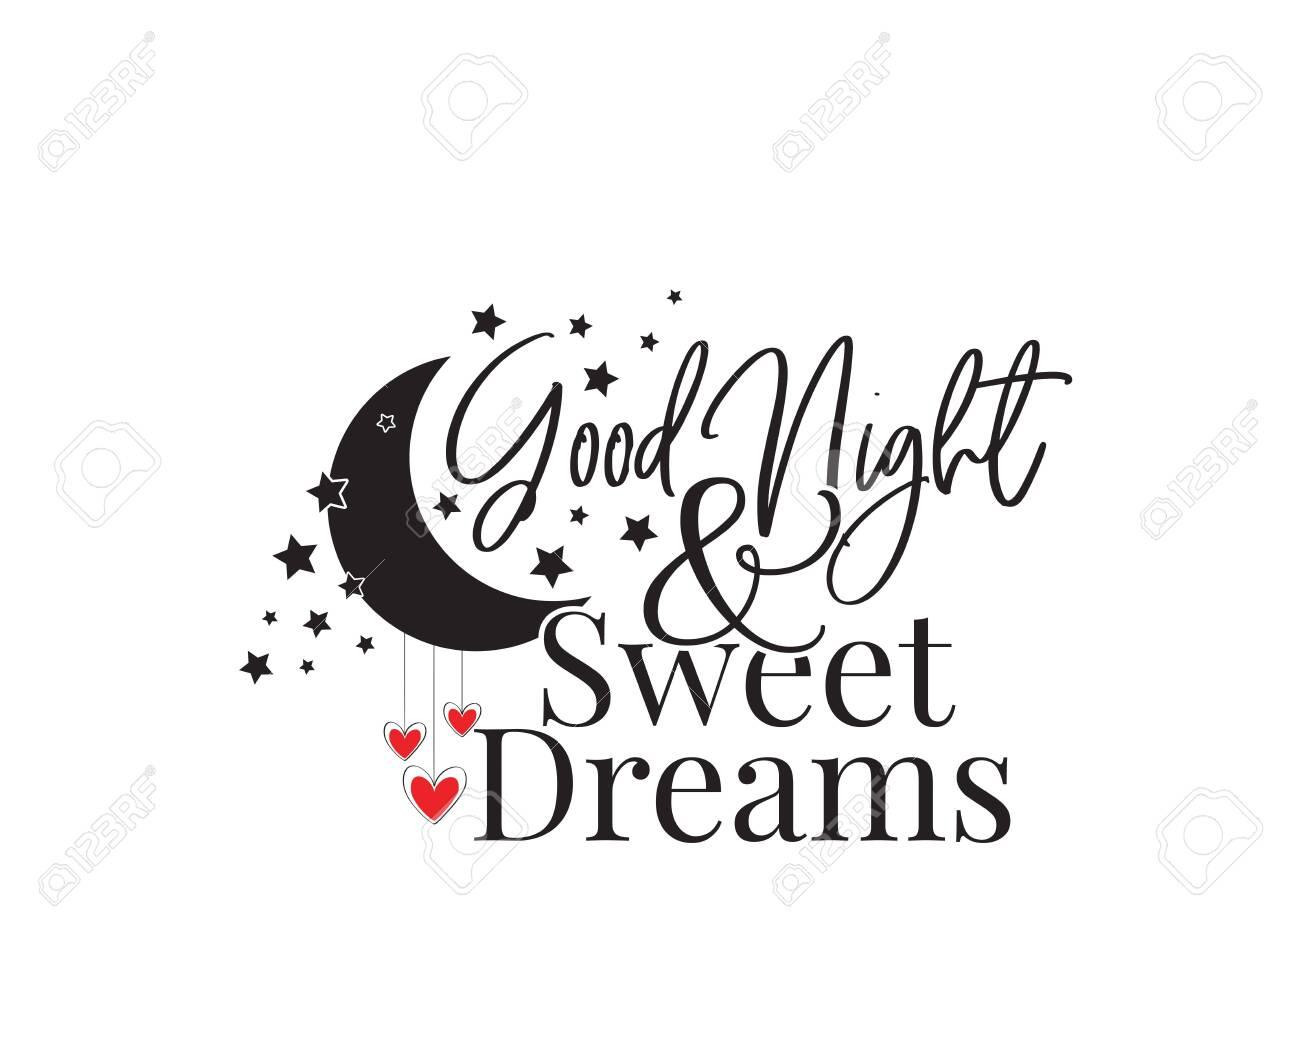 Kostenlos bilder good night sweet dreams Good Night